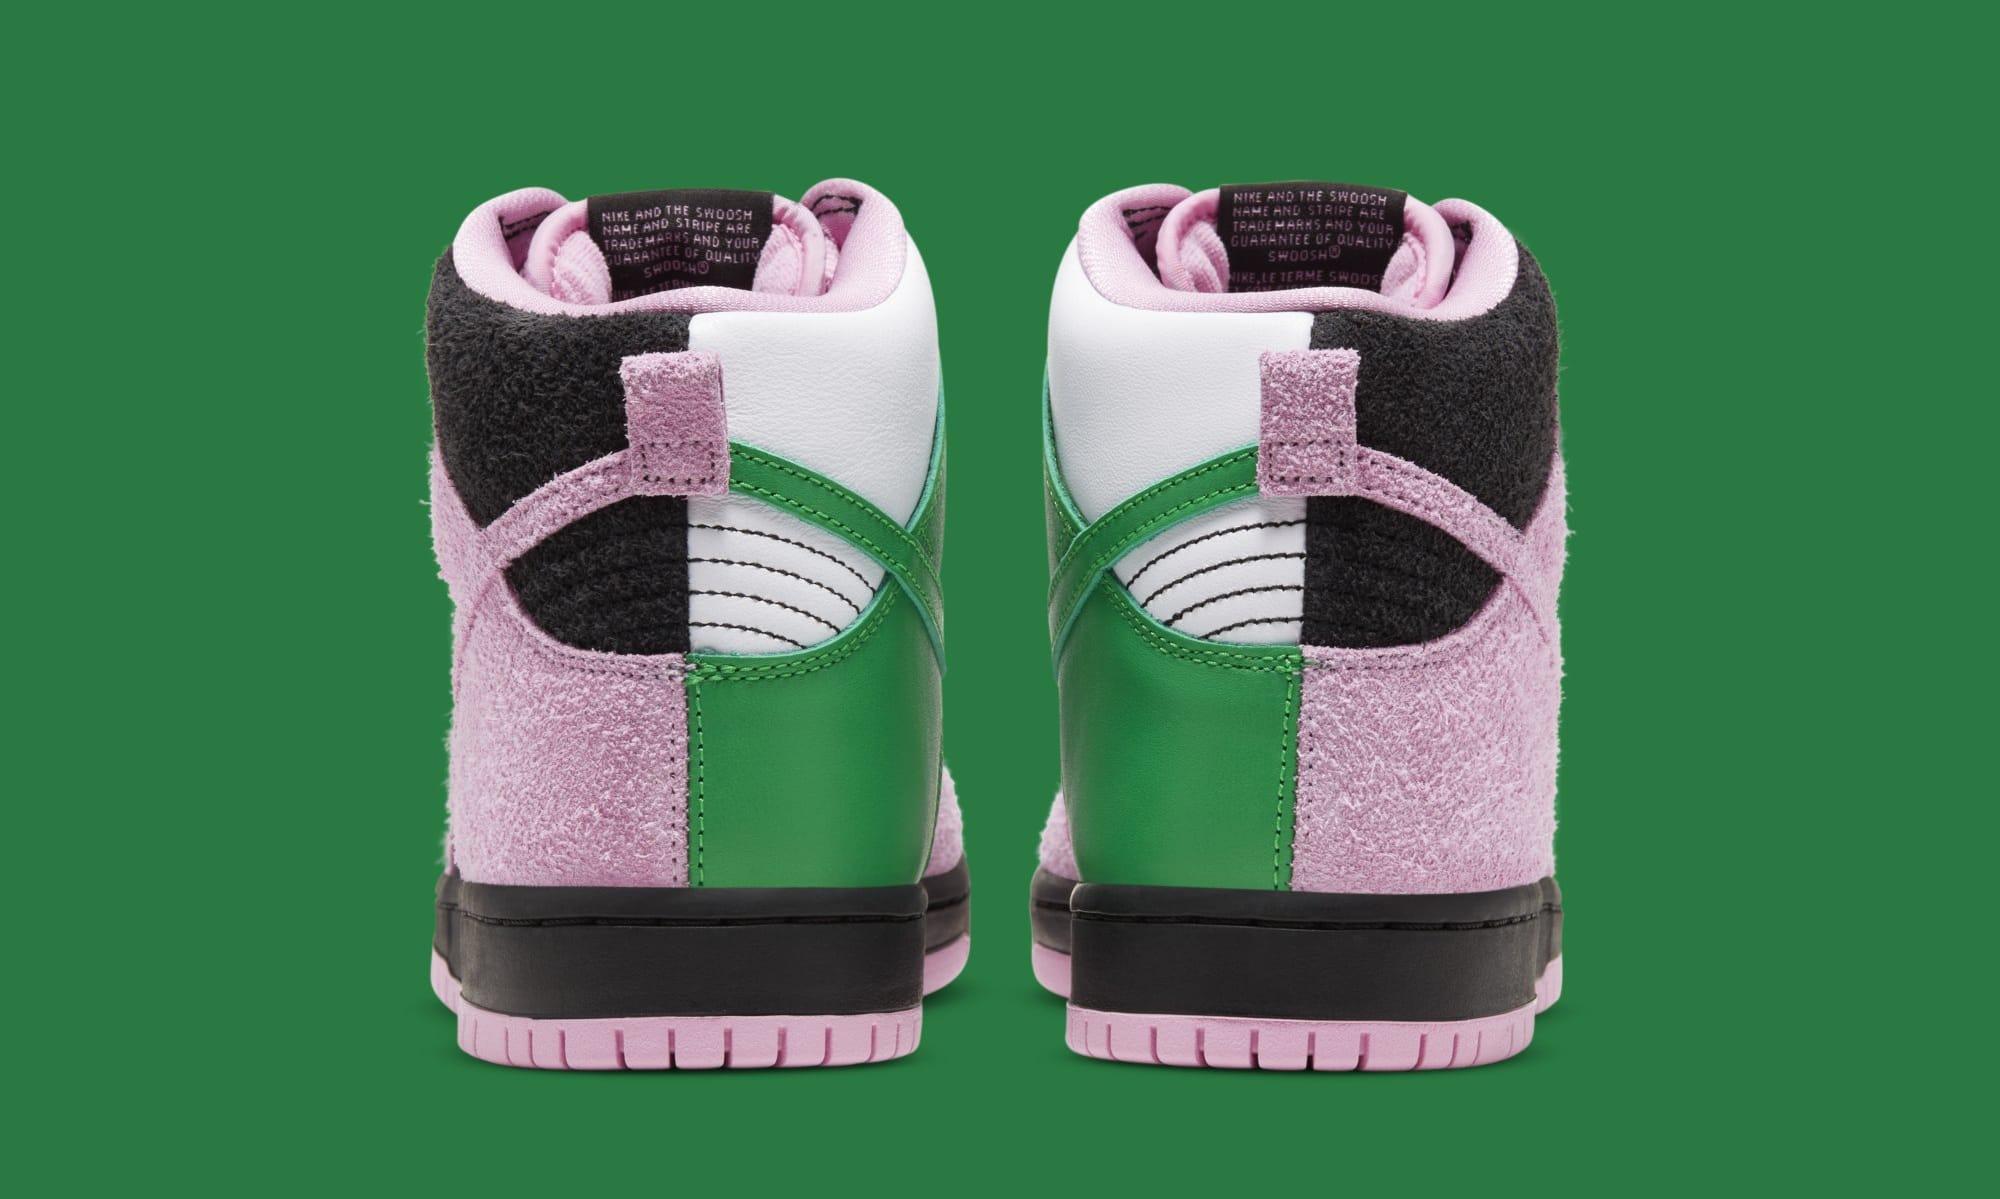 Nike SB Dunk High 'Invert Celtics' CU7349-001 Heel